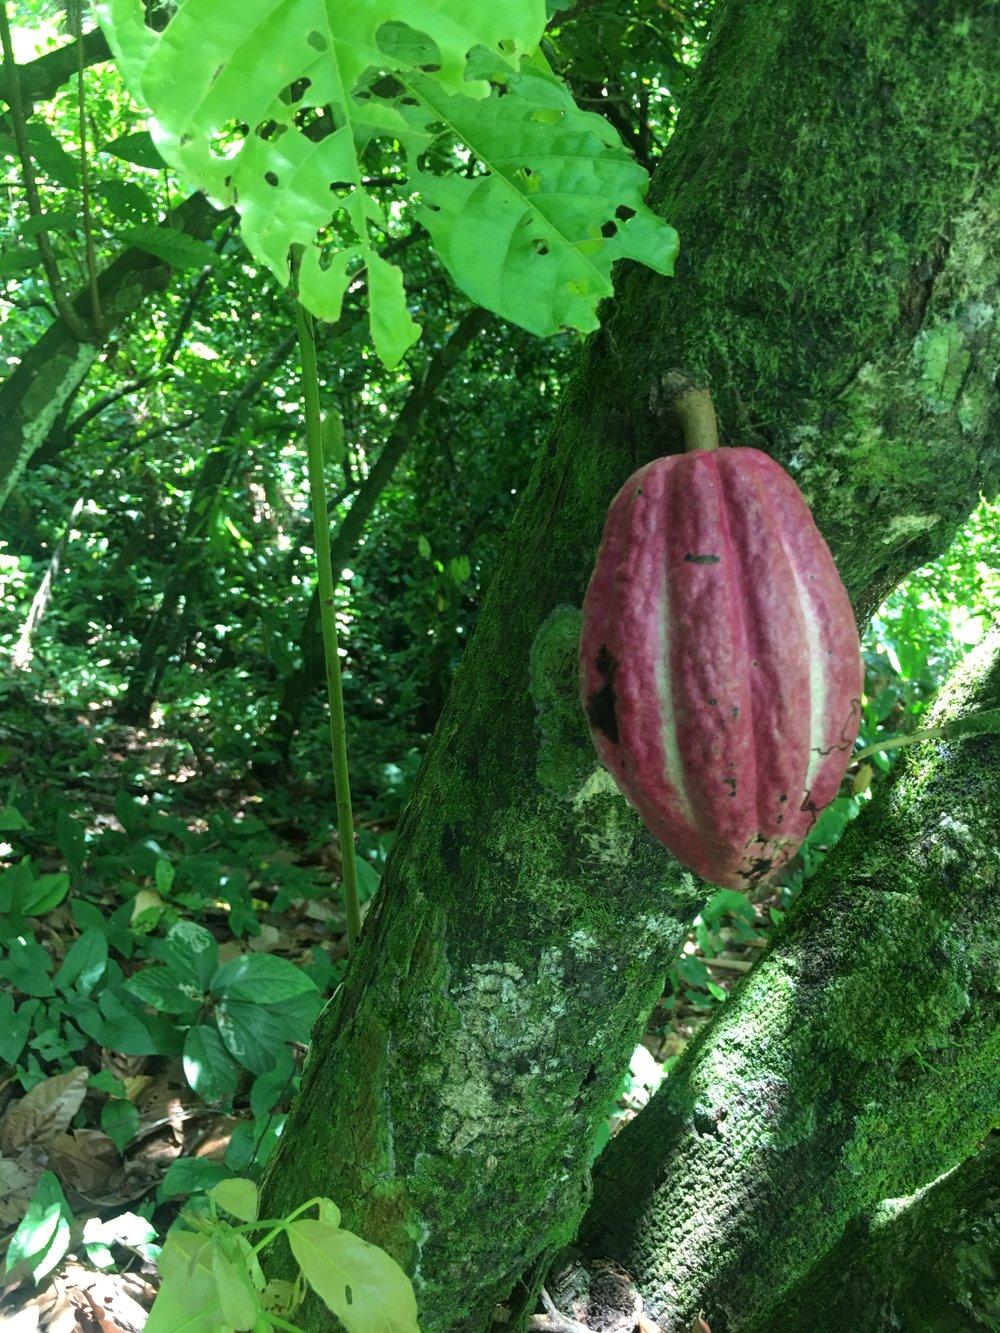 Cacao pod on tree in Isla Bastimentos,Bocos del Toro,Panama at Up in the Hill organic farm